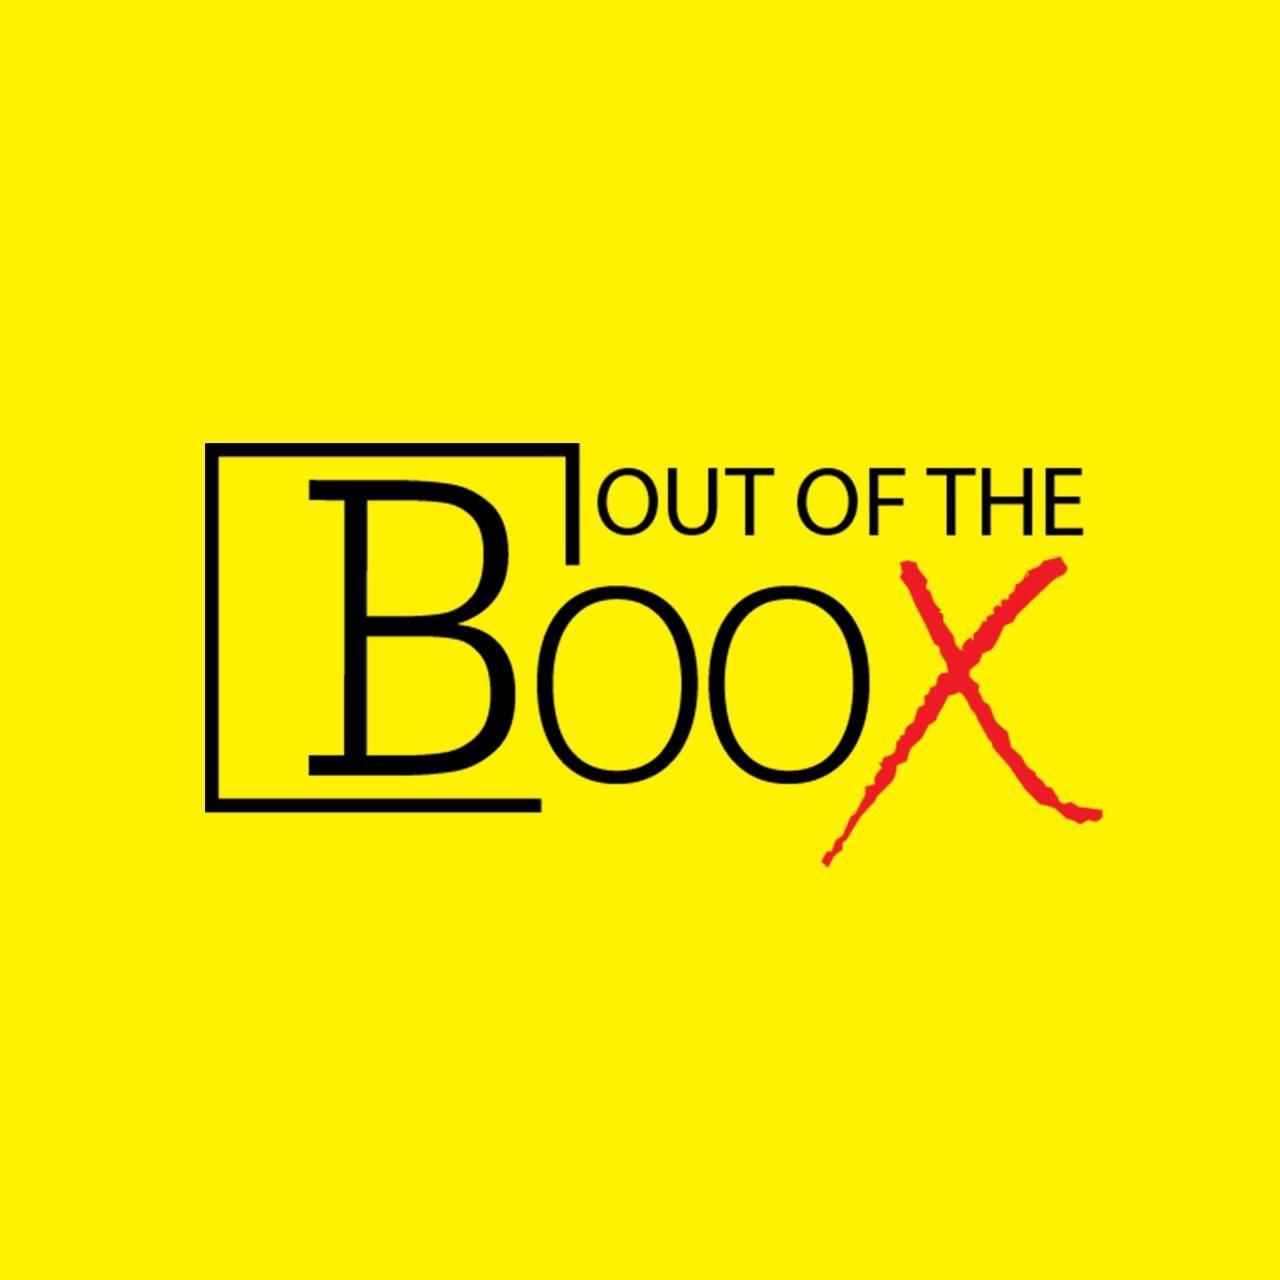 @Outoftheboox Profile Image | Linktree